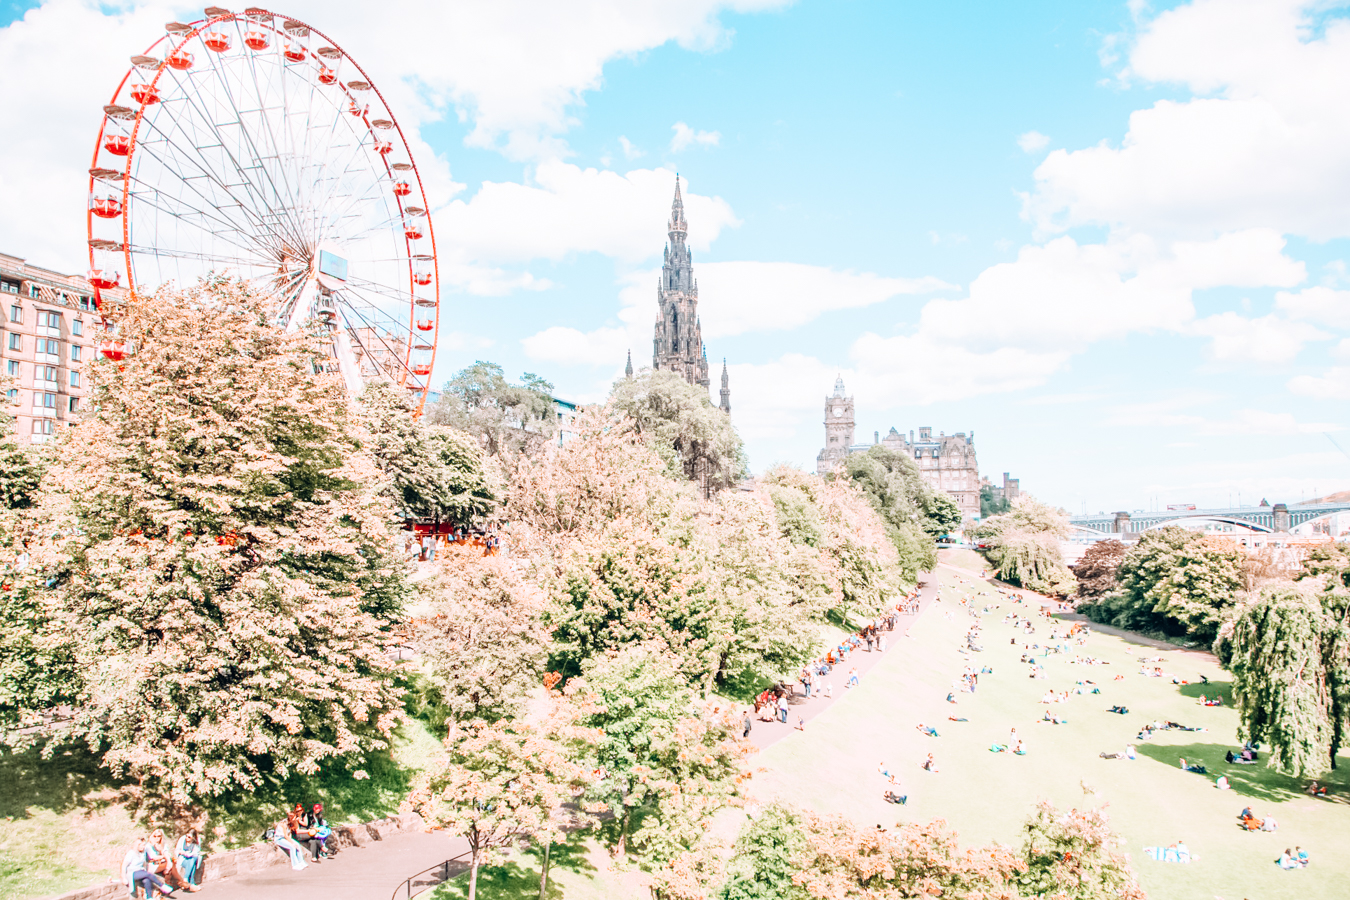 Nature and ferris wheel in Edinburgh